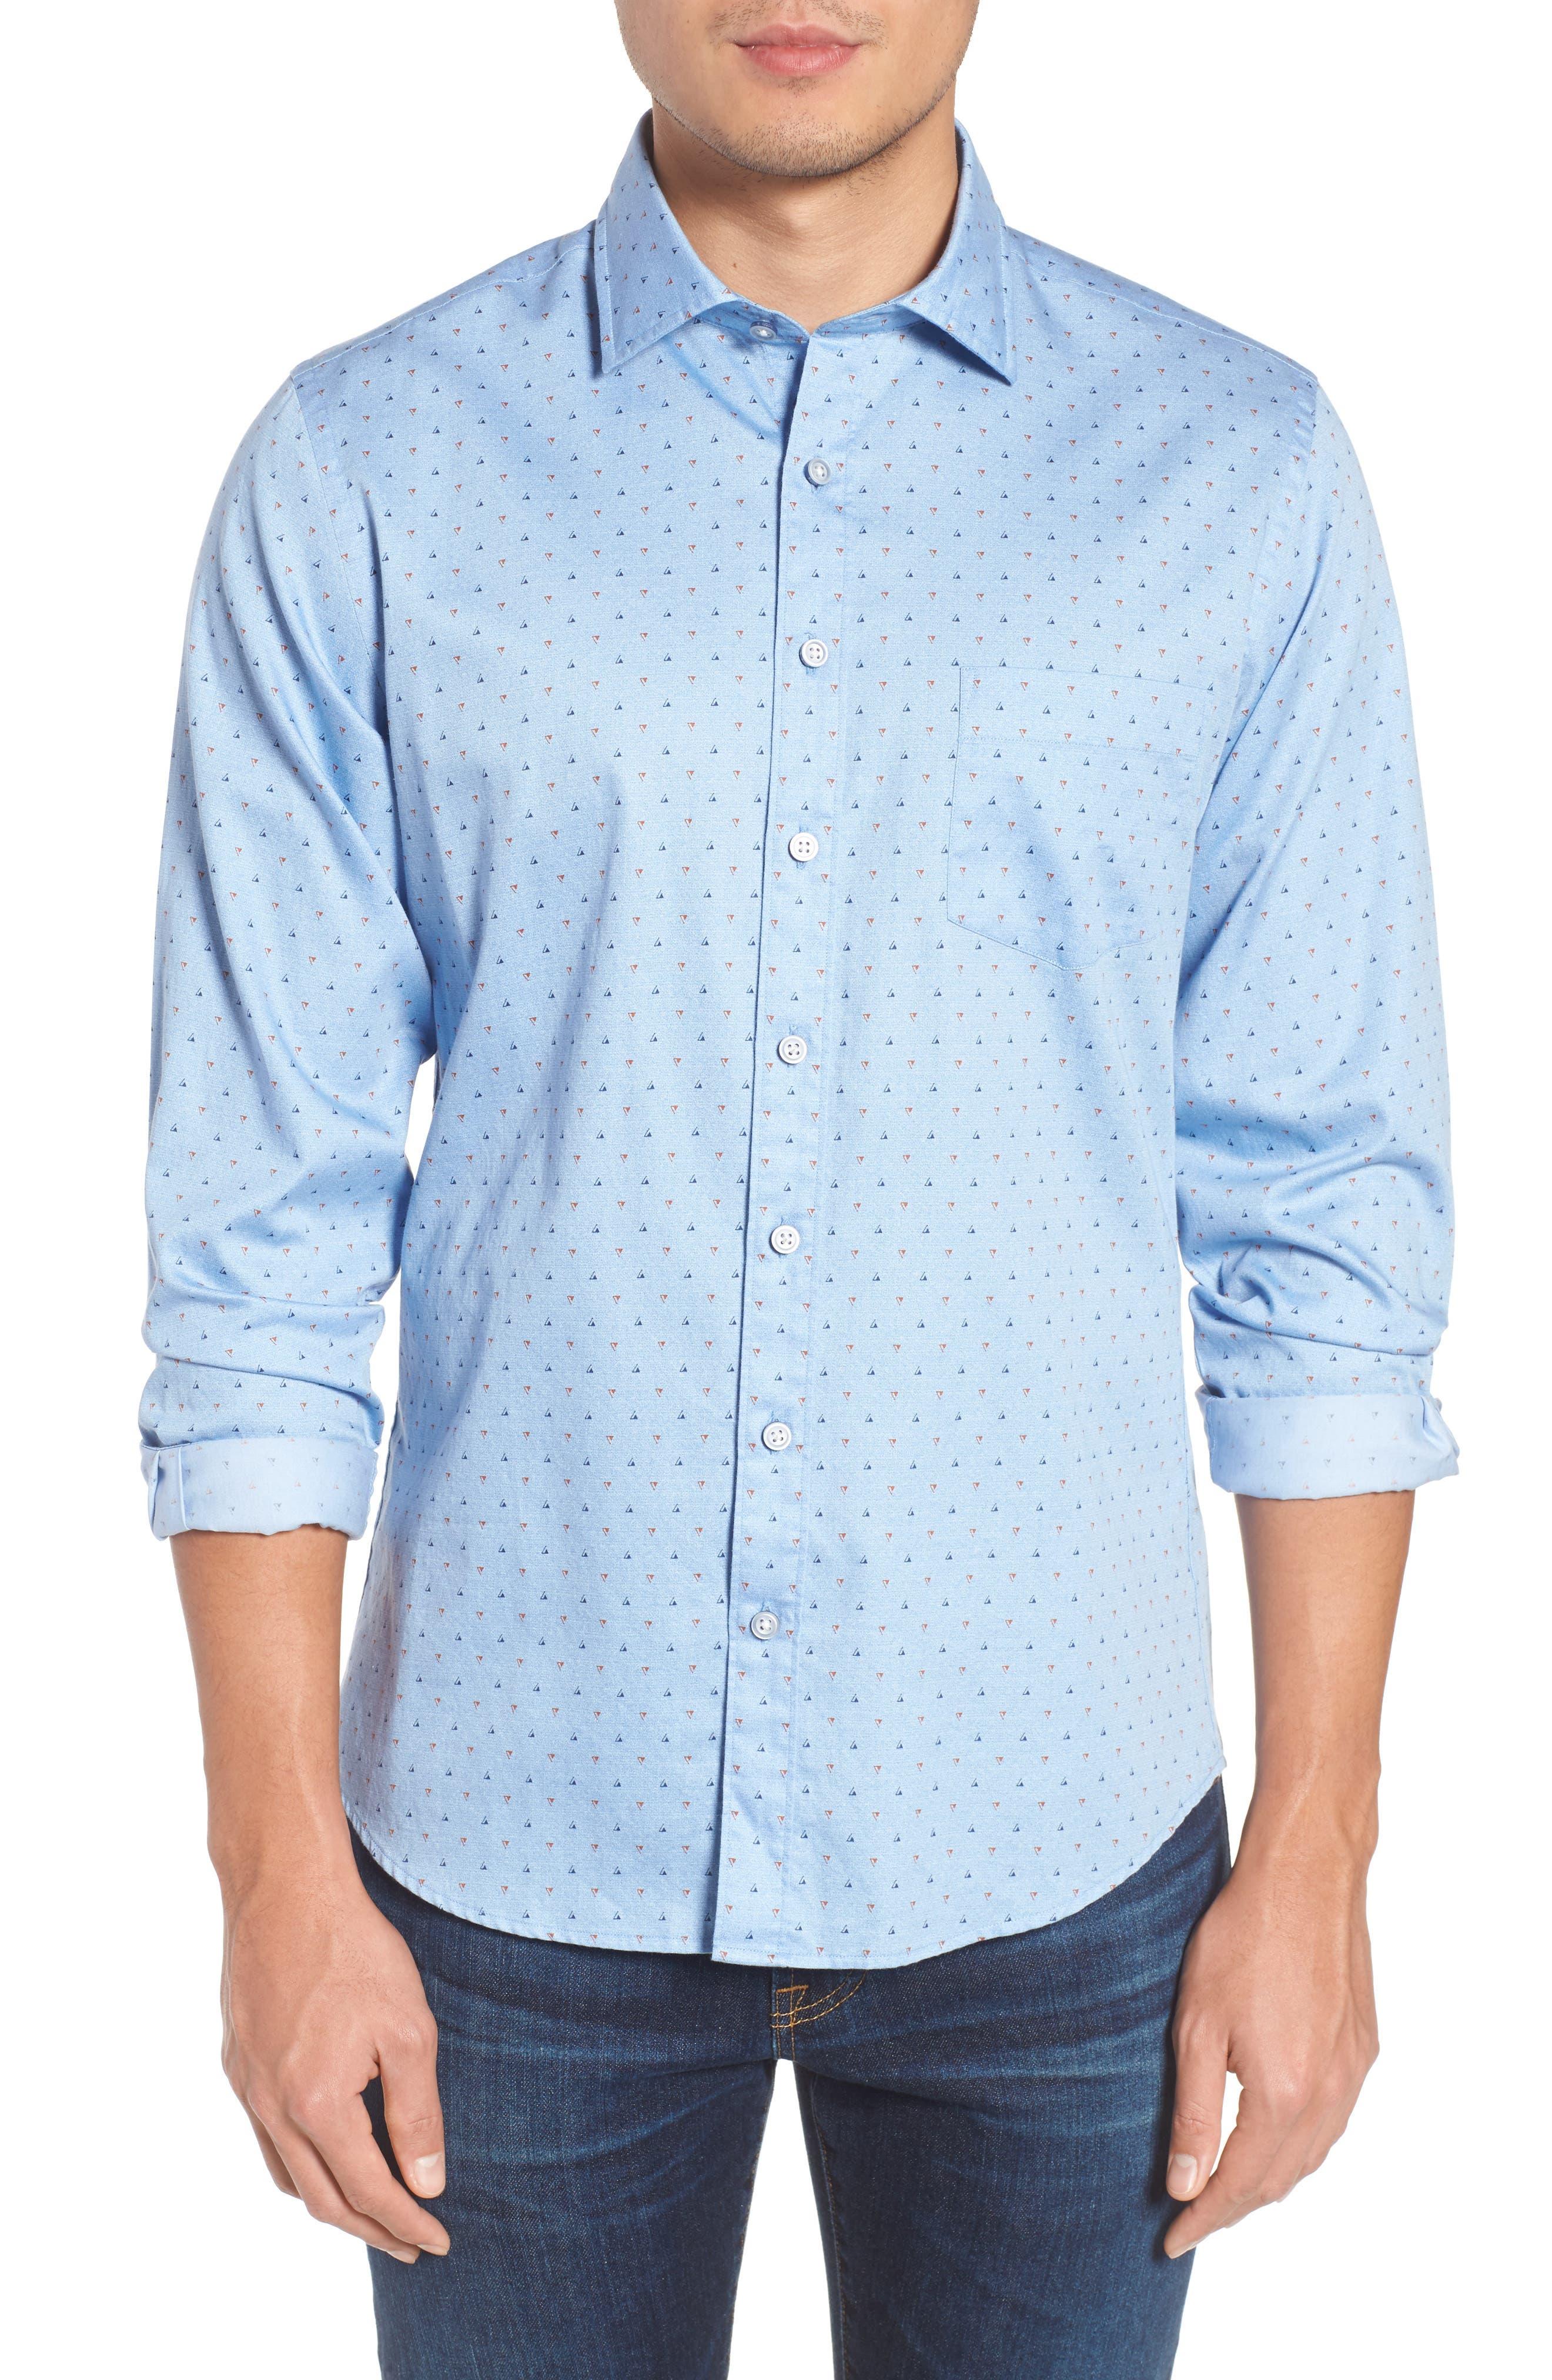 Penzance Regular Fit Sport Shirt,                             Main thumbnail 1, color,                             456